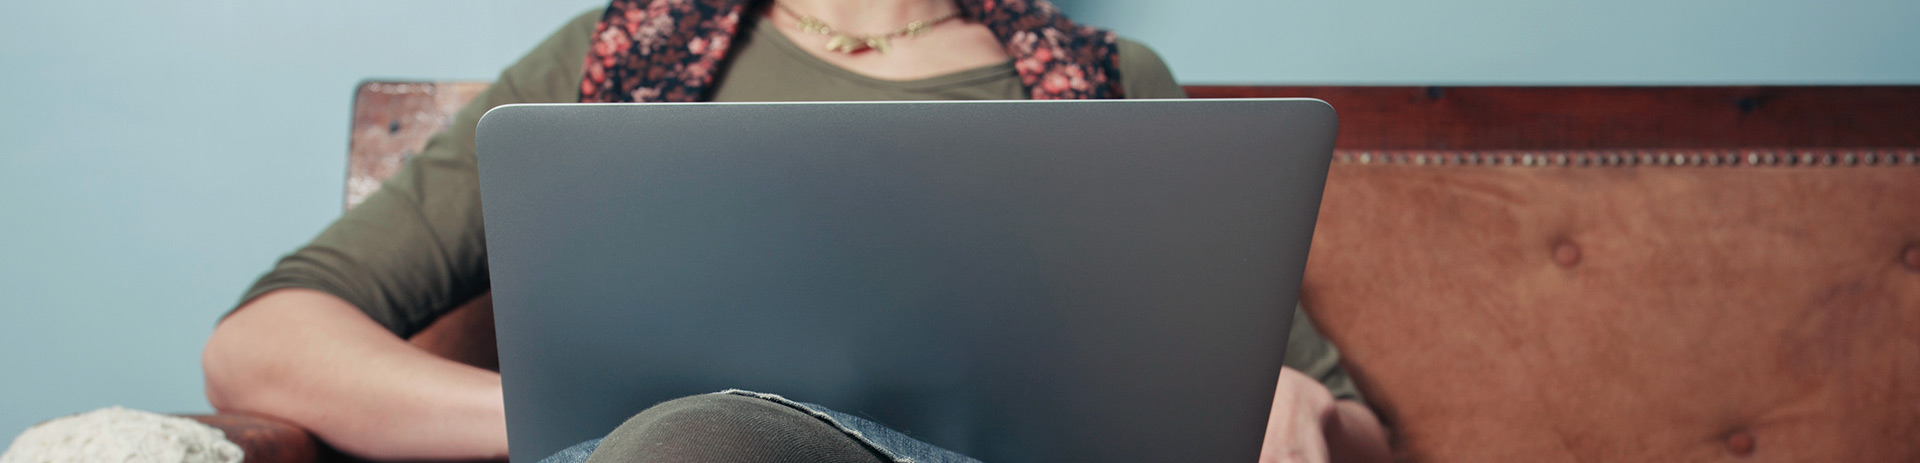 Frau mit Laptop auf roter Ledercouch